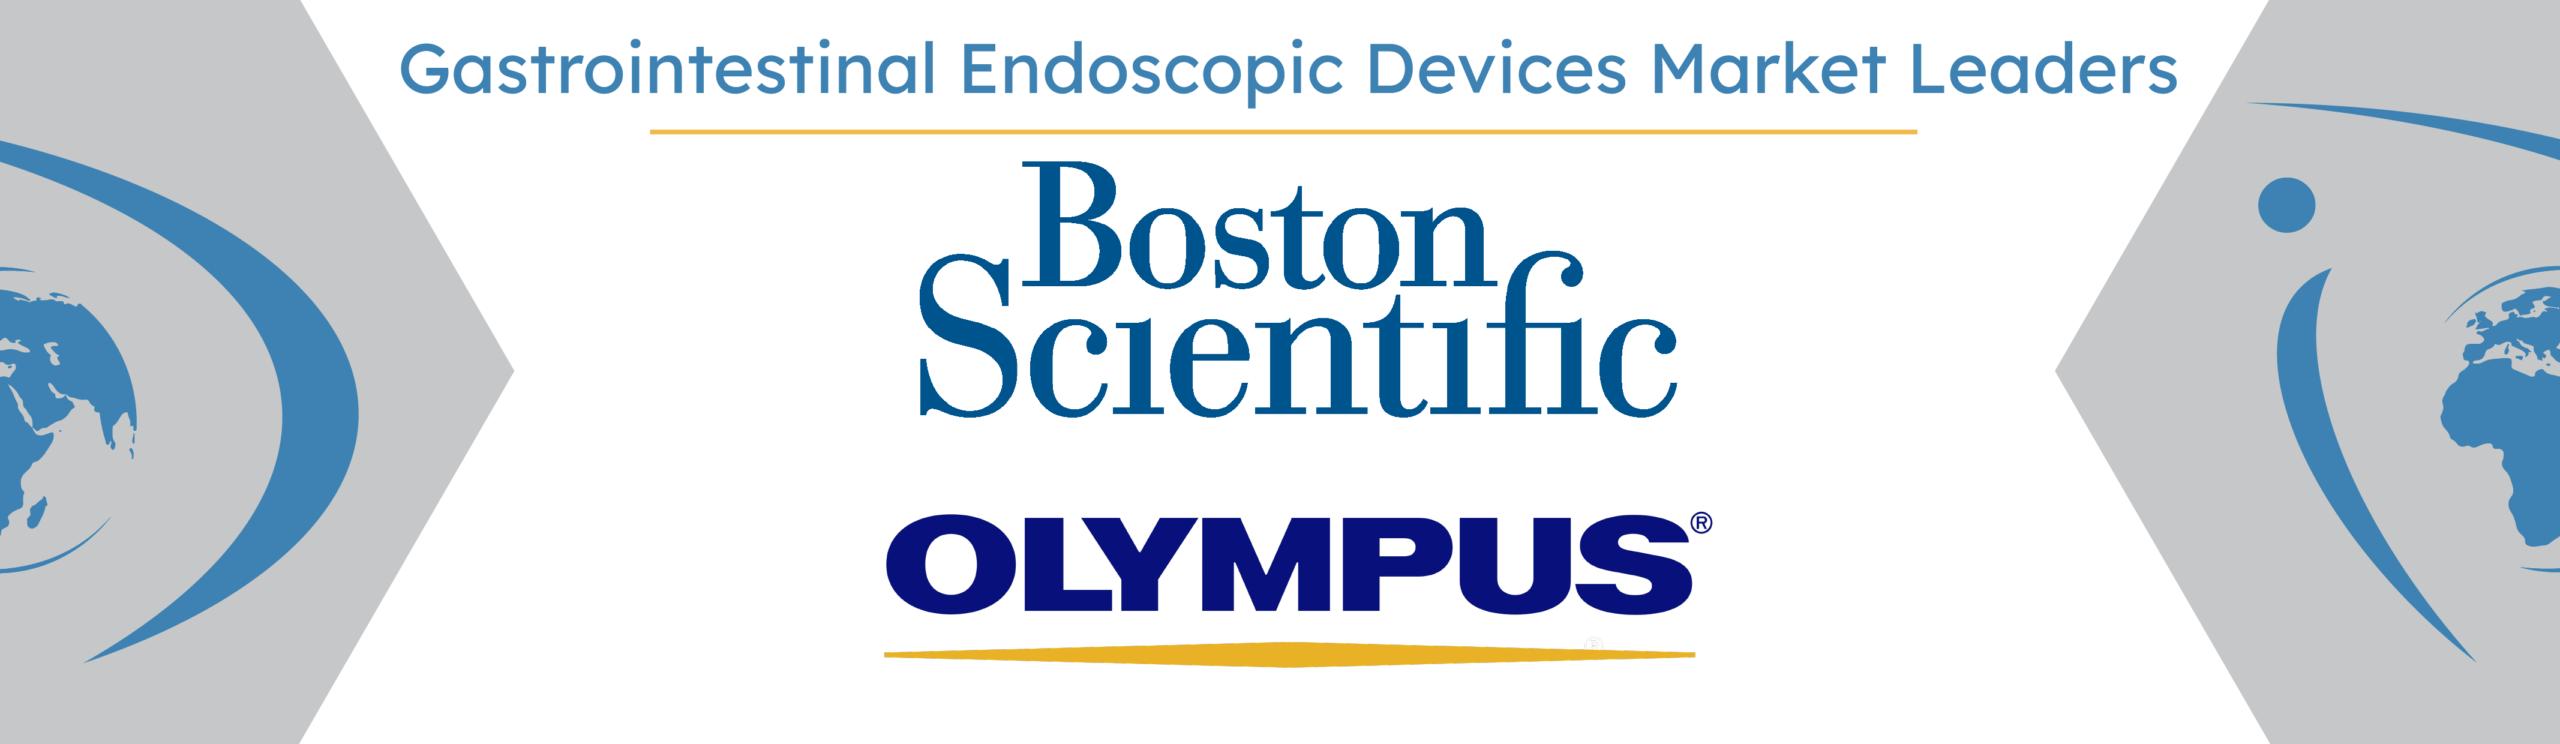 Gastrointestinal Endoscopy Devices Market Leaders